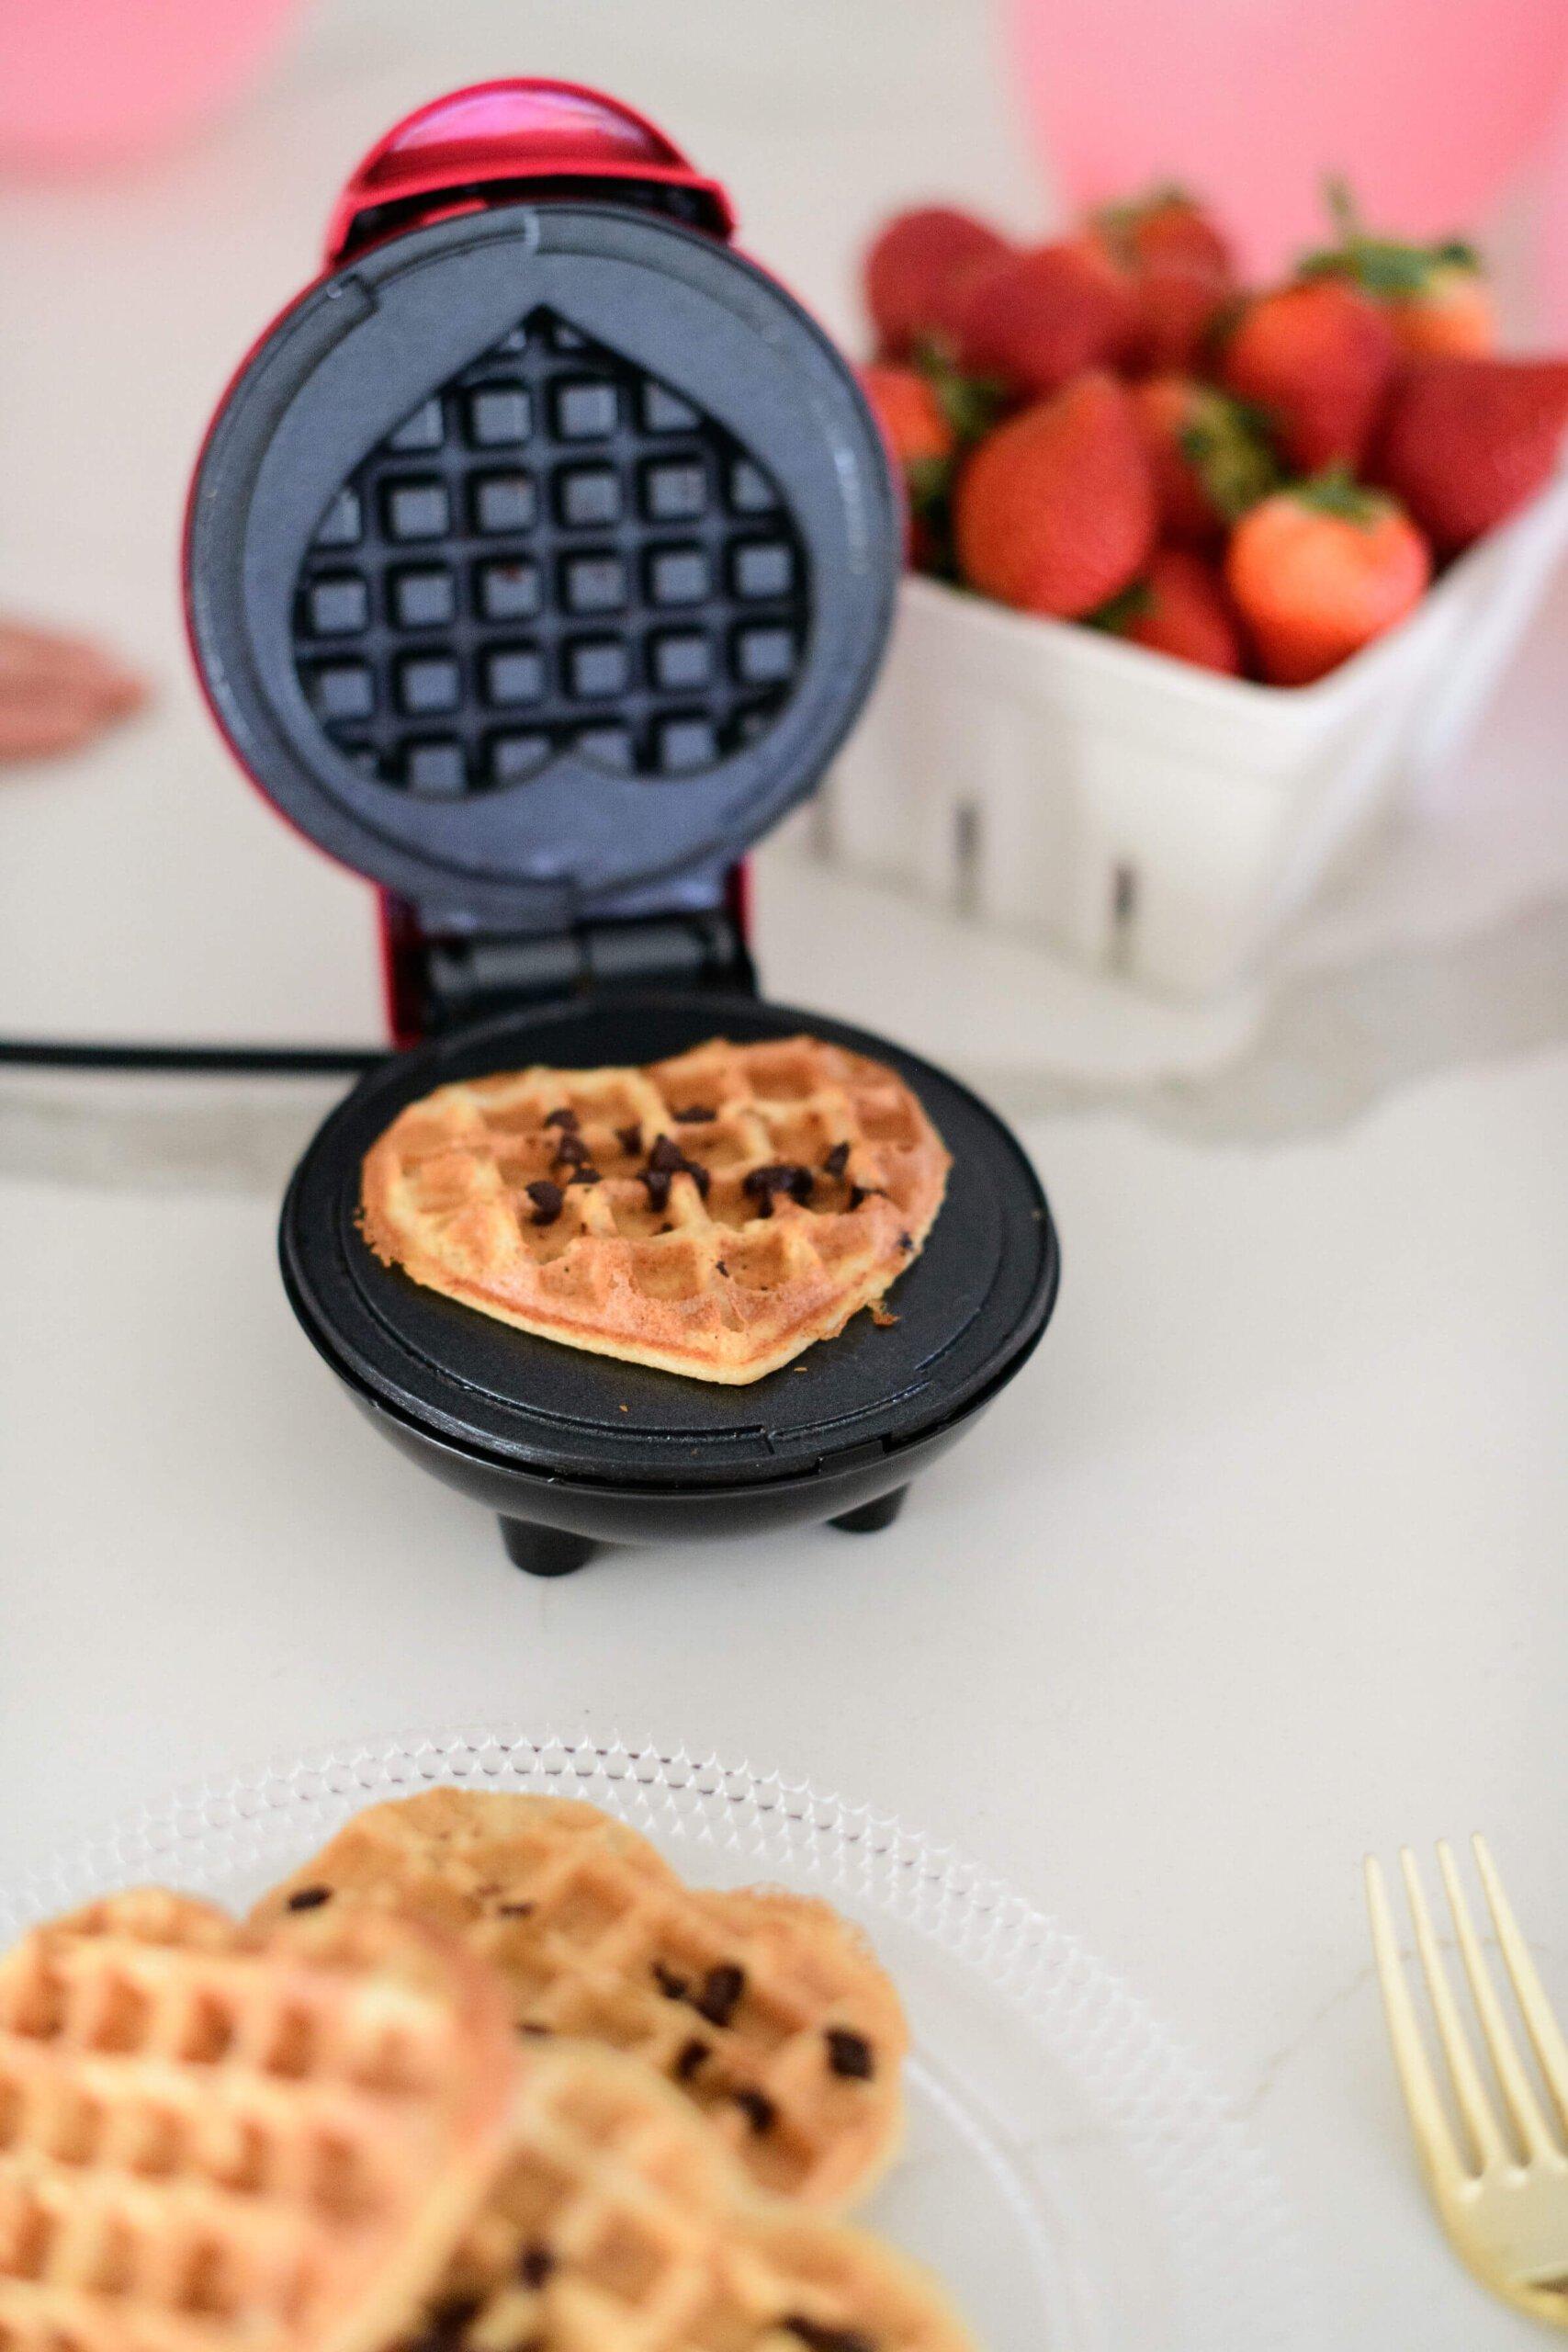 a waffle maker opened with a chocolate chip waffle inside